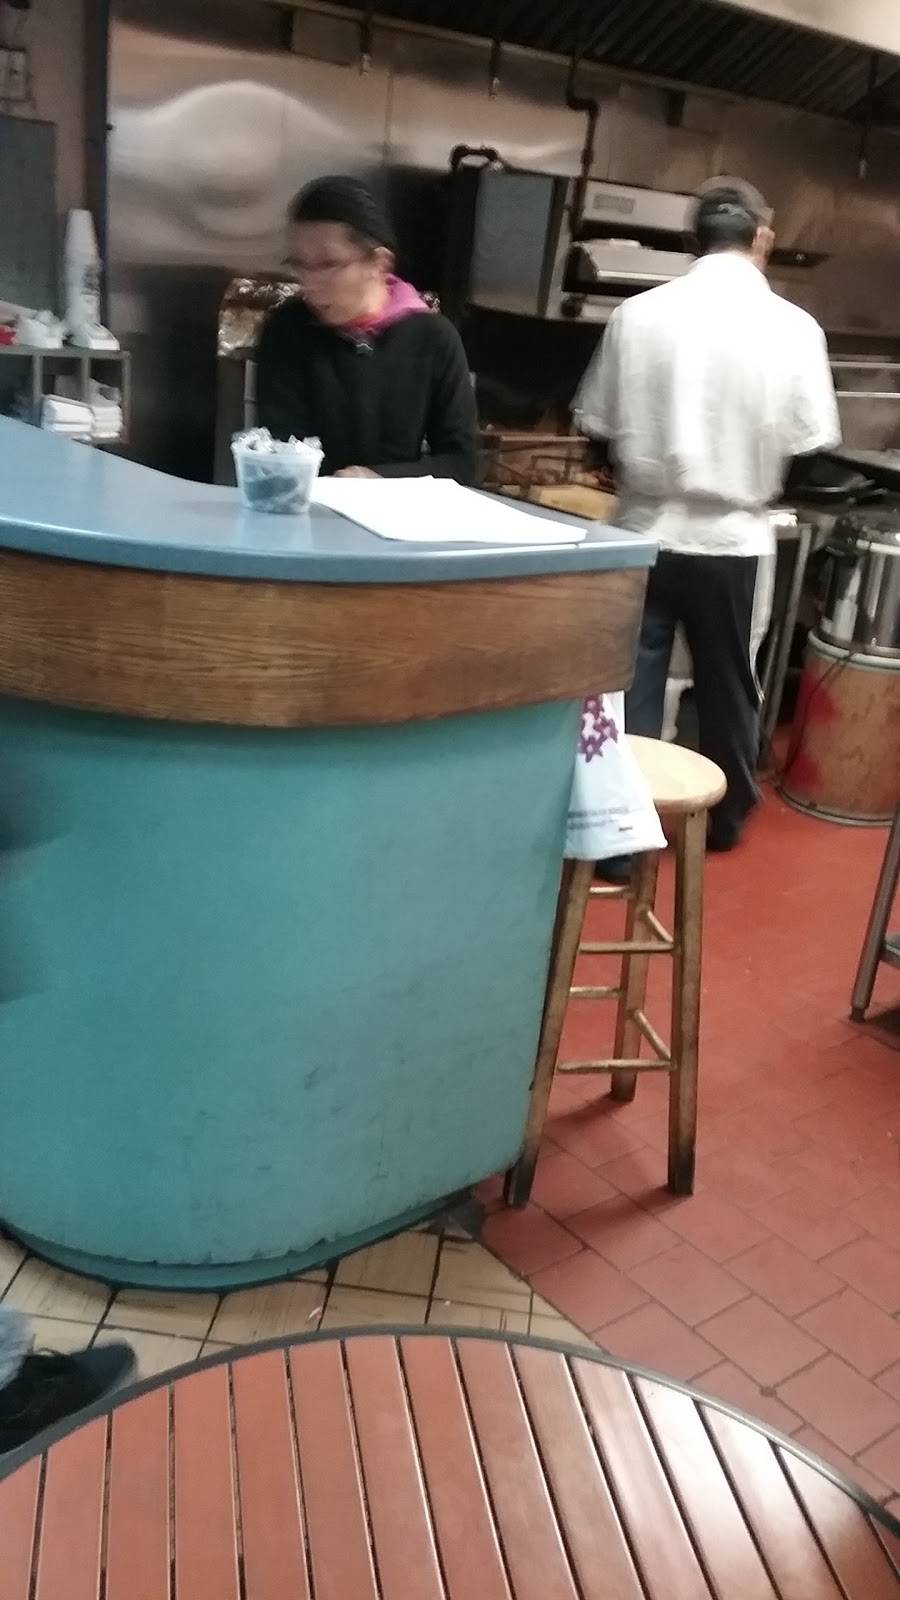 Ho Mei | restaurant | 103-05 37th Ave, Flushing, NY 11368, USA | 7187796903 OR +1 718-779-6903